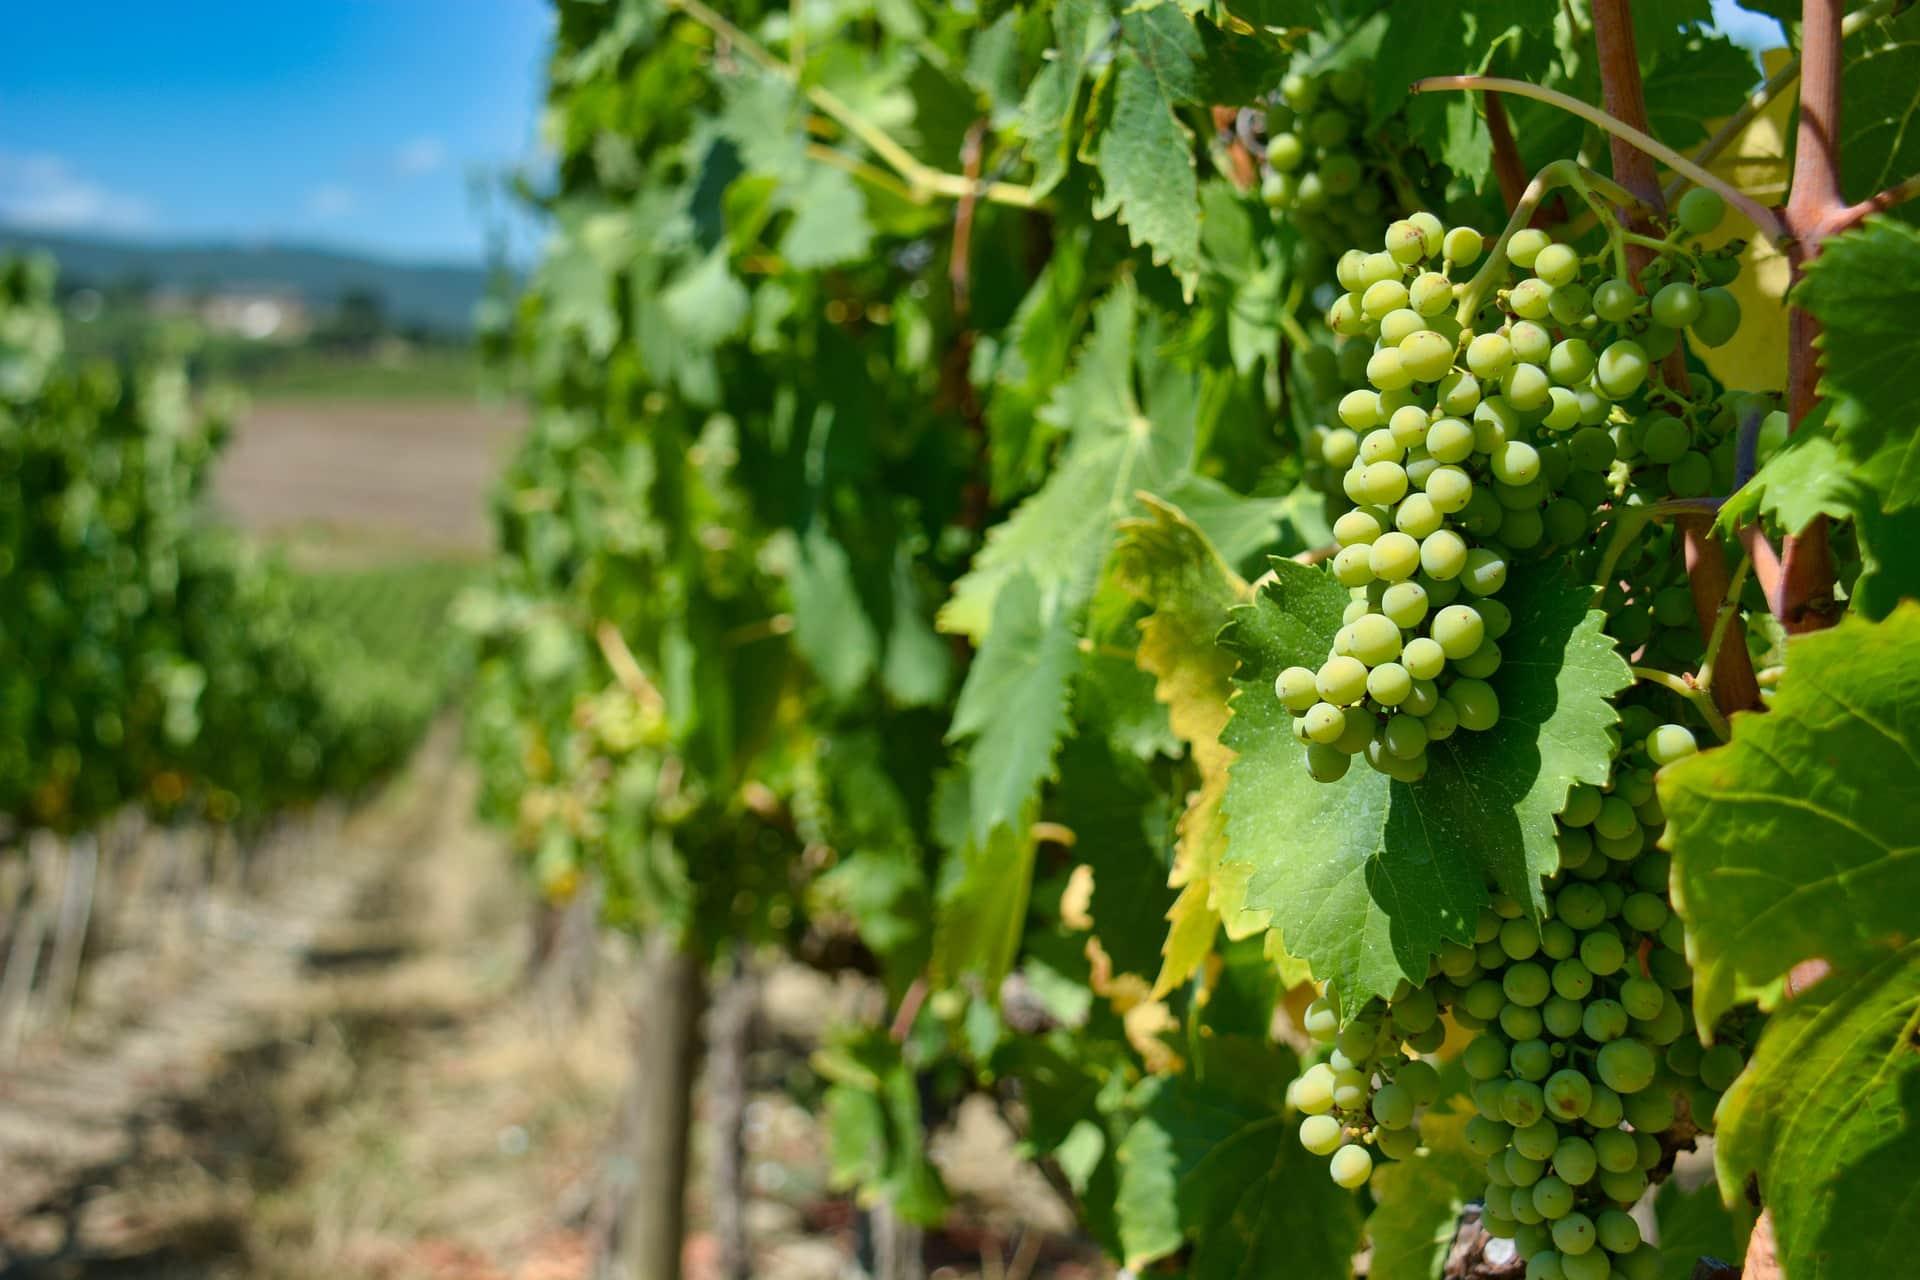 Vineyard Management Tips